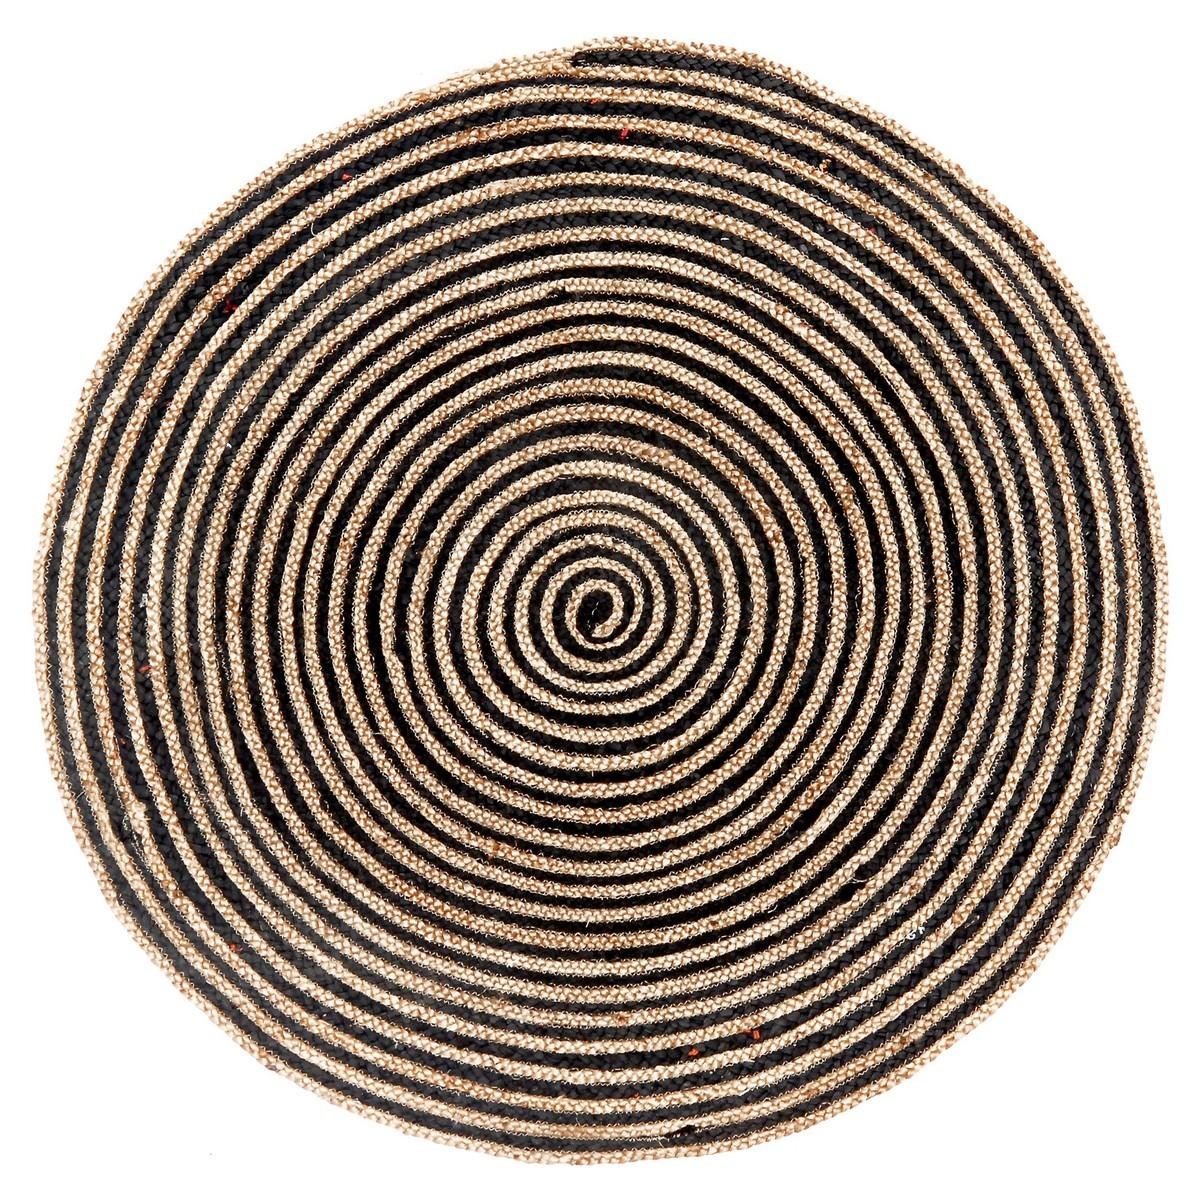 Kerla Swirl Handmade Round Jute & Cotton Rug, 120cm, Natural / Black